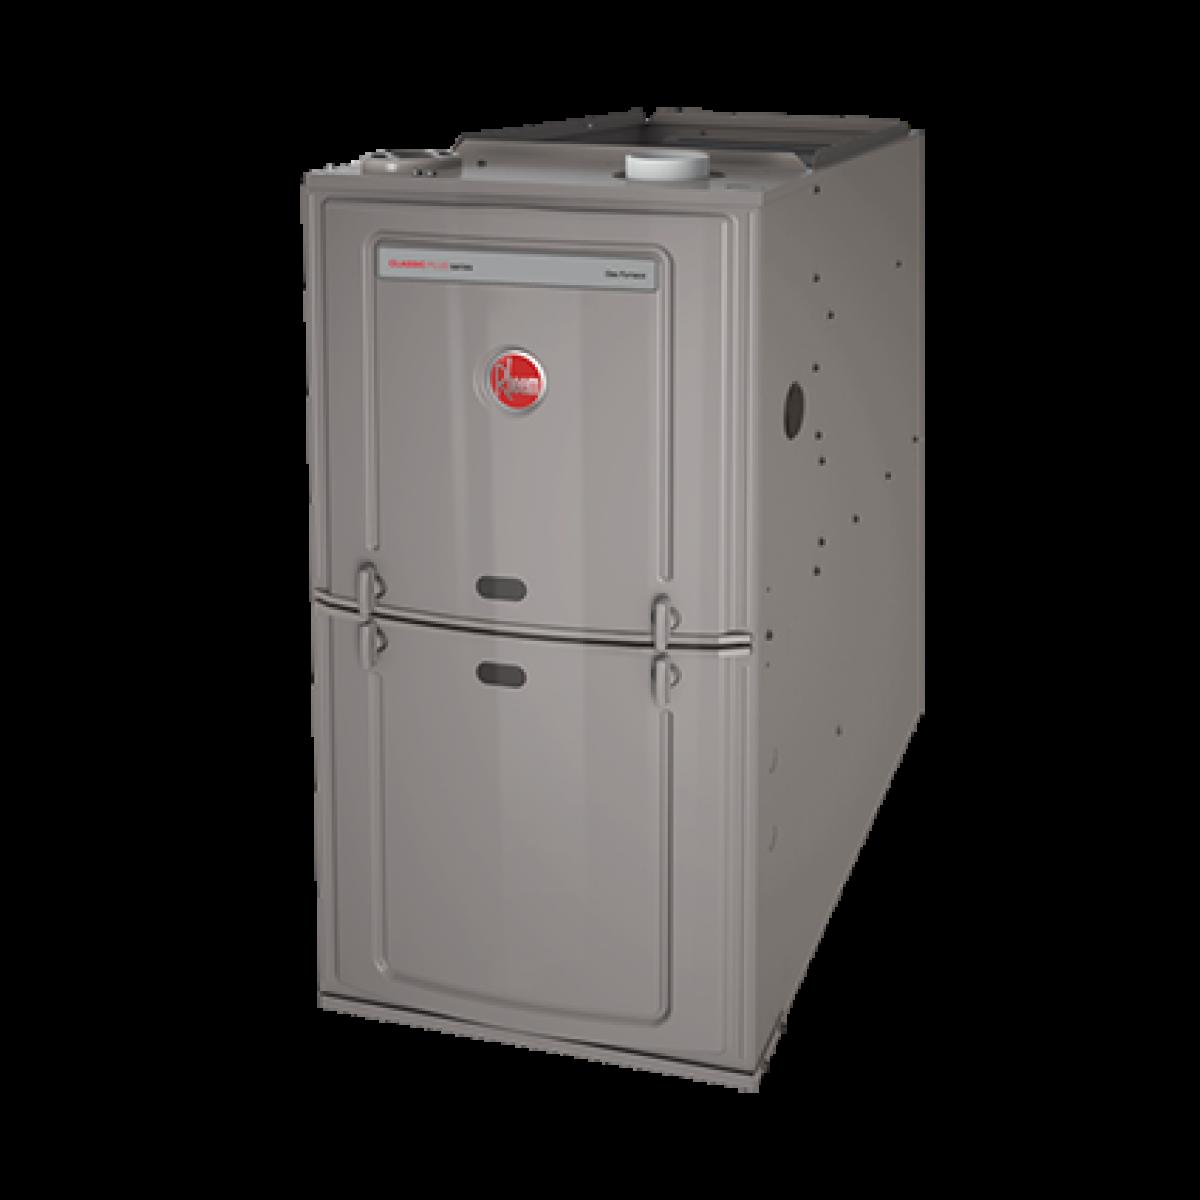 Rheem 80 50k Btu Natural Gas Furnace With 3 Ton Blower